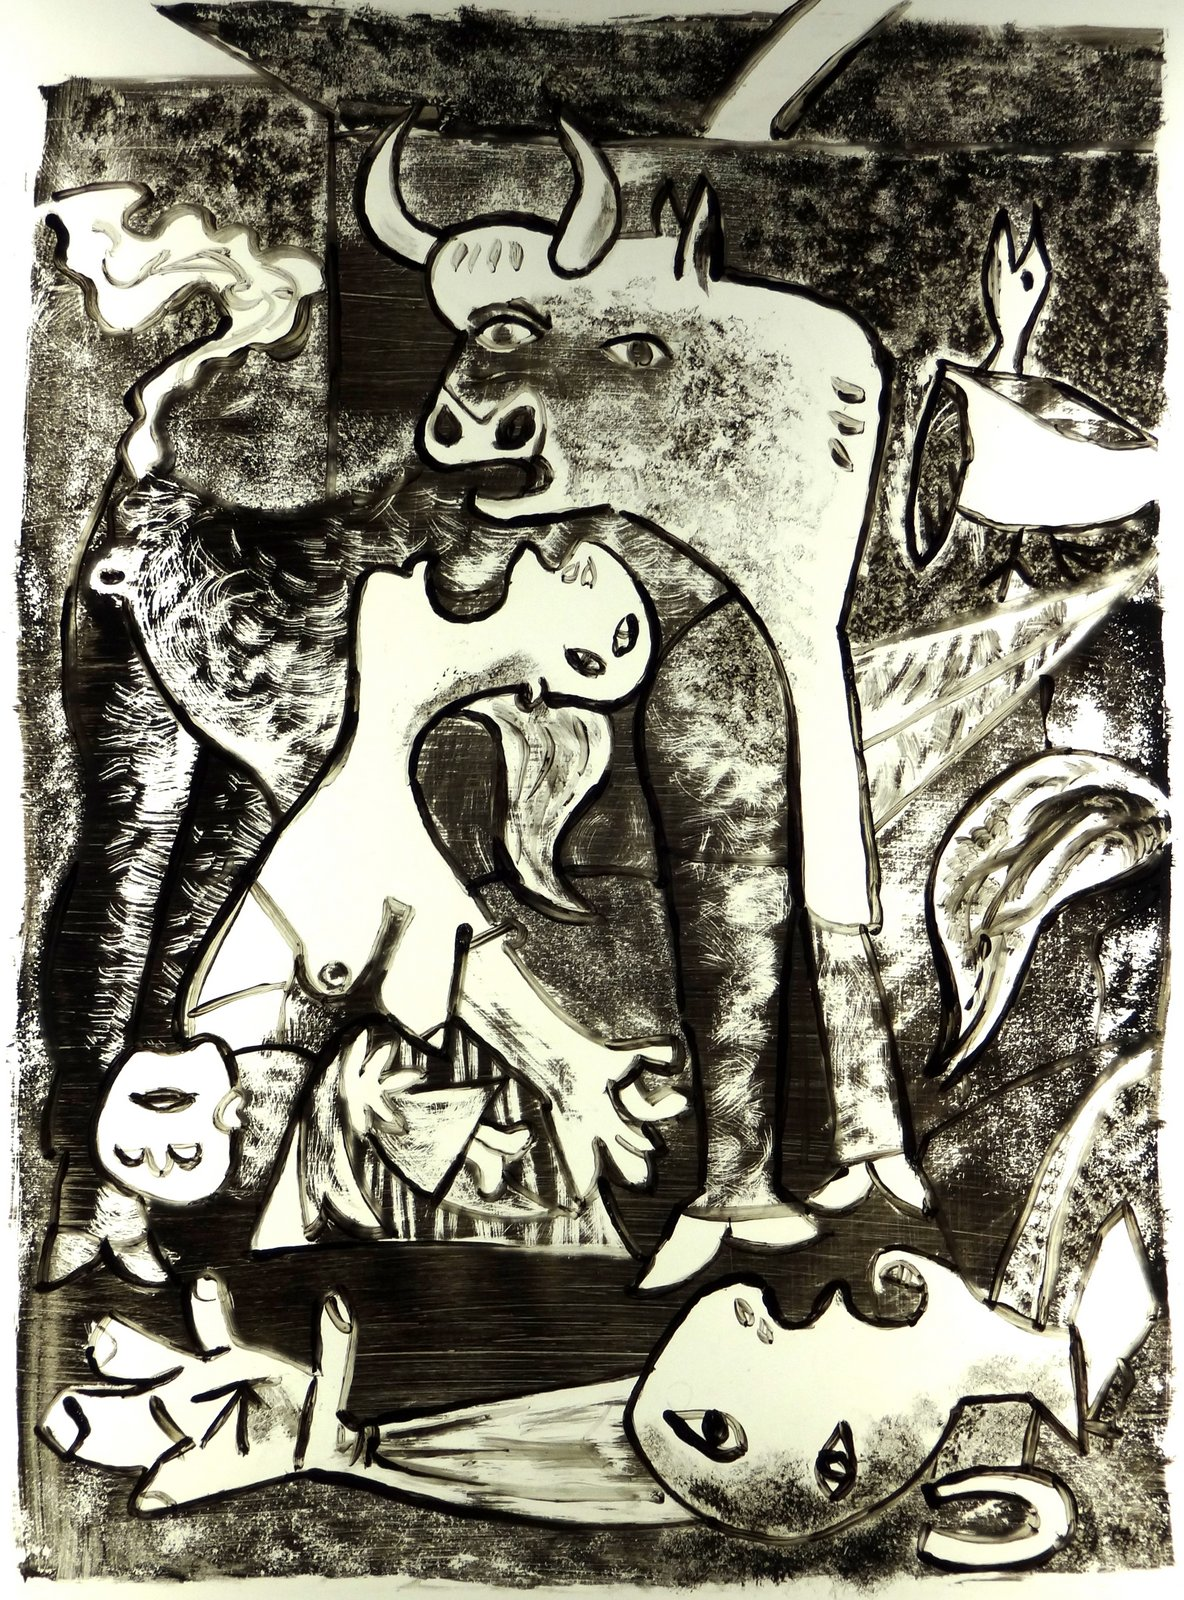 Picasso Guernica Sketches rene fijten sketches: ...